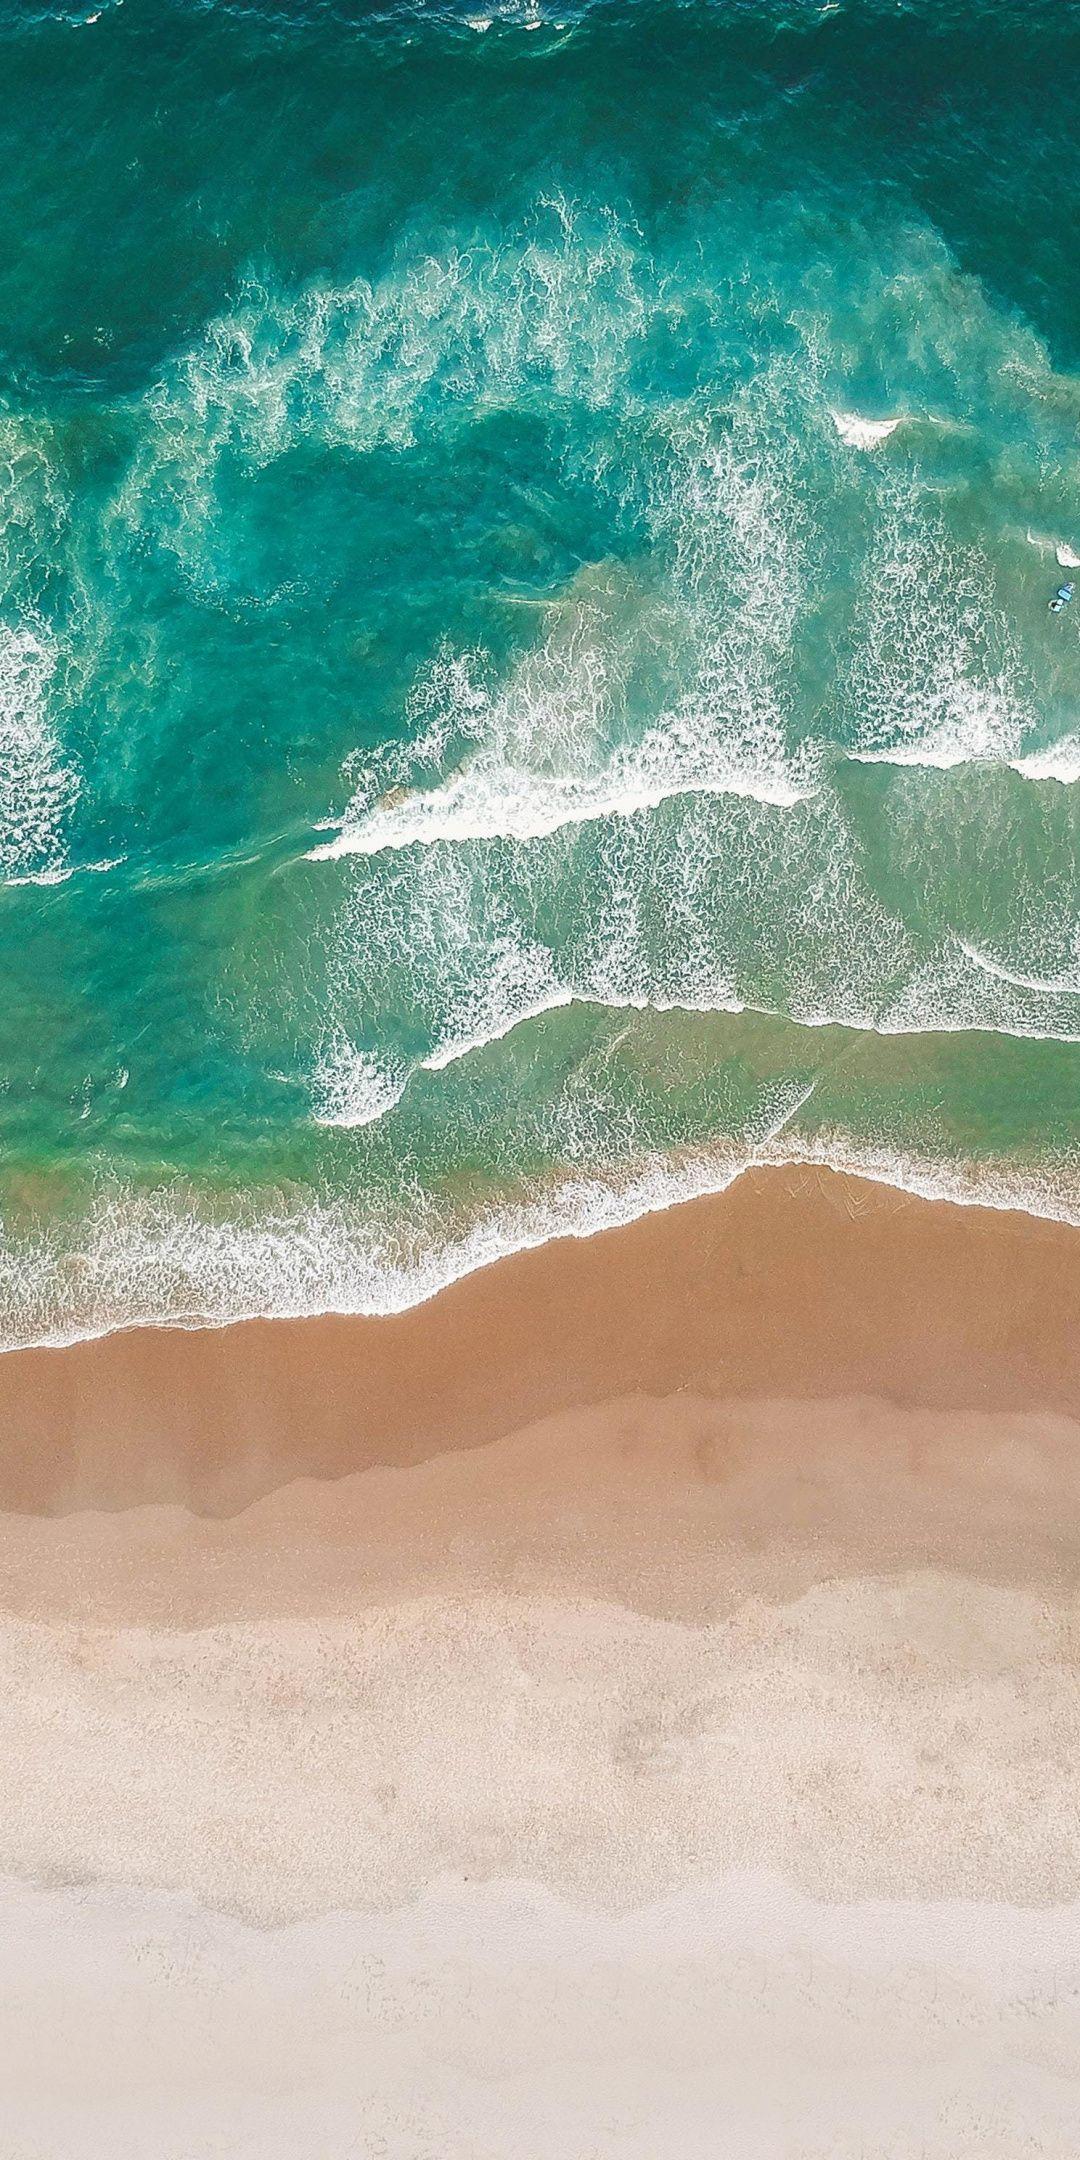 1080x2160 Green Waves Beach Aerial View Wallpaper View Wallpaper Iphone Wallpaper Ocean Aerial View